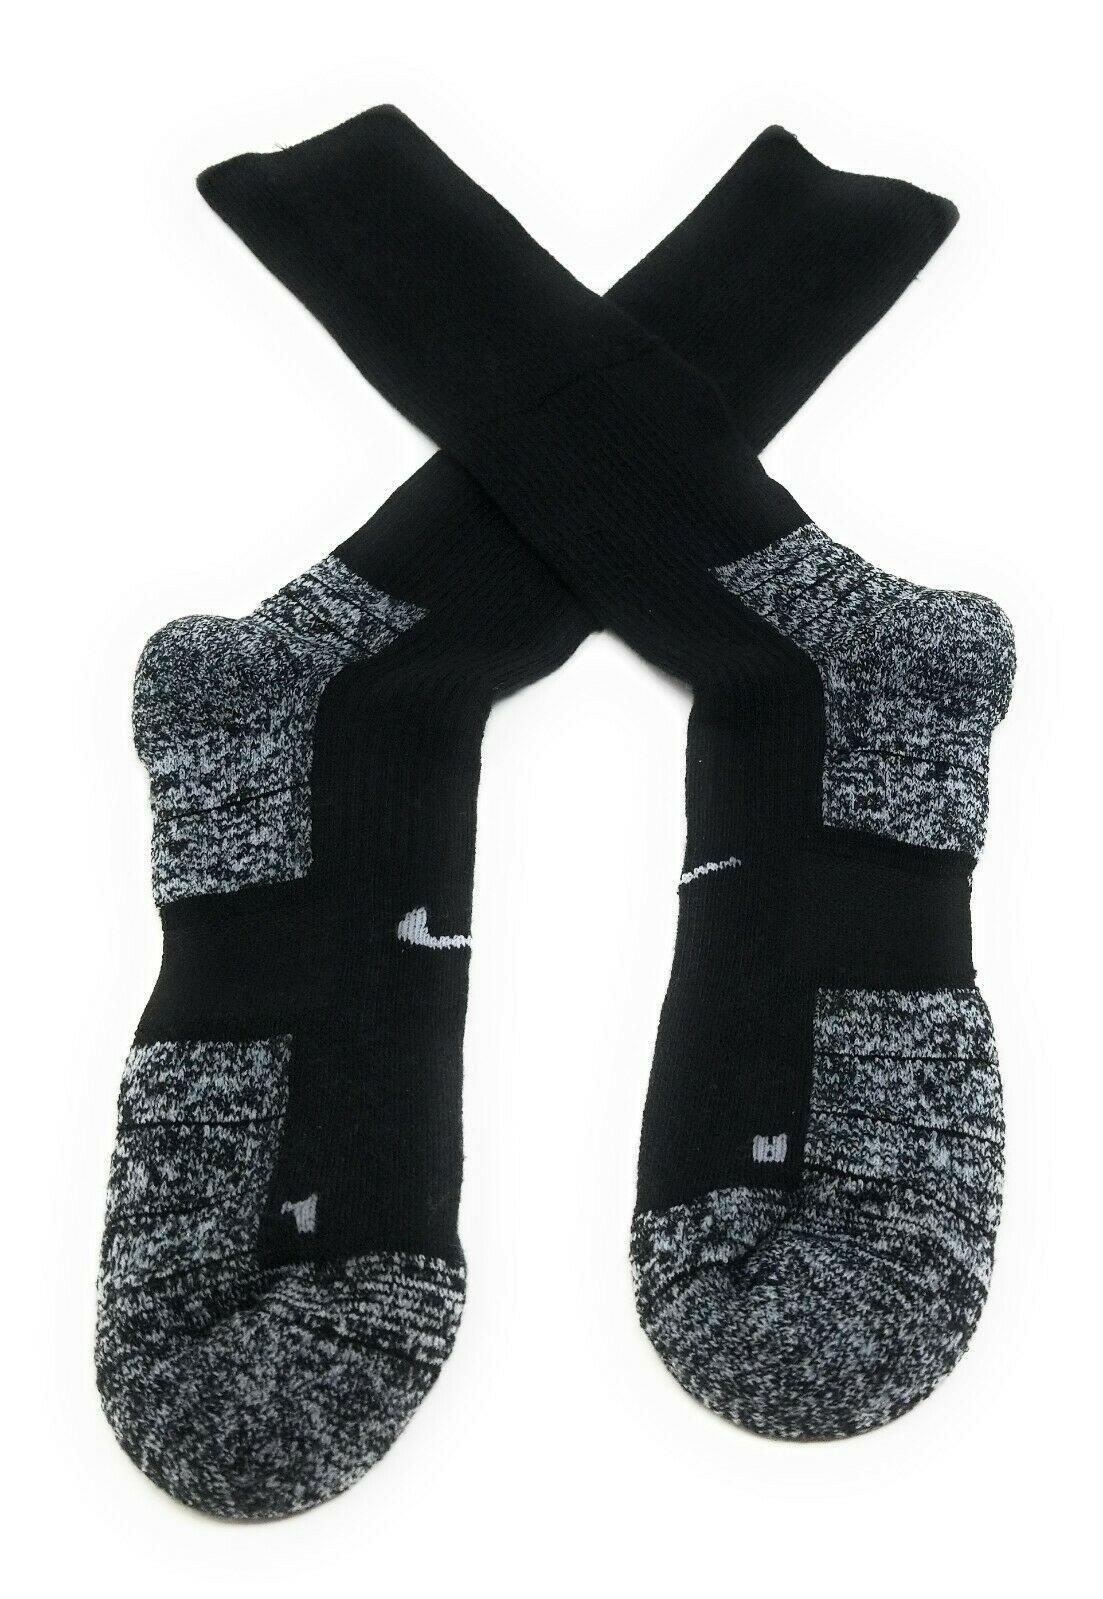 Nike Socks Crew Mens XL 12-15 Black Dri Fit Cushioned Athletic Performance Sport image 5